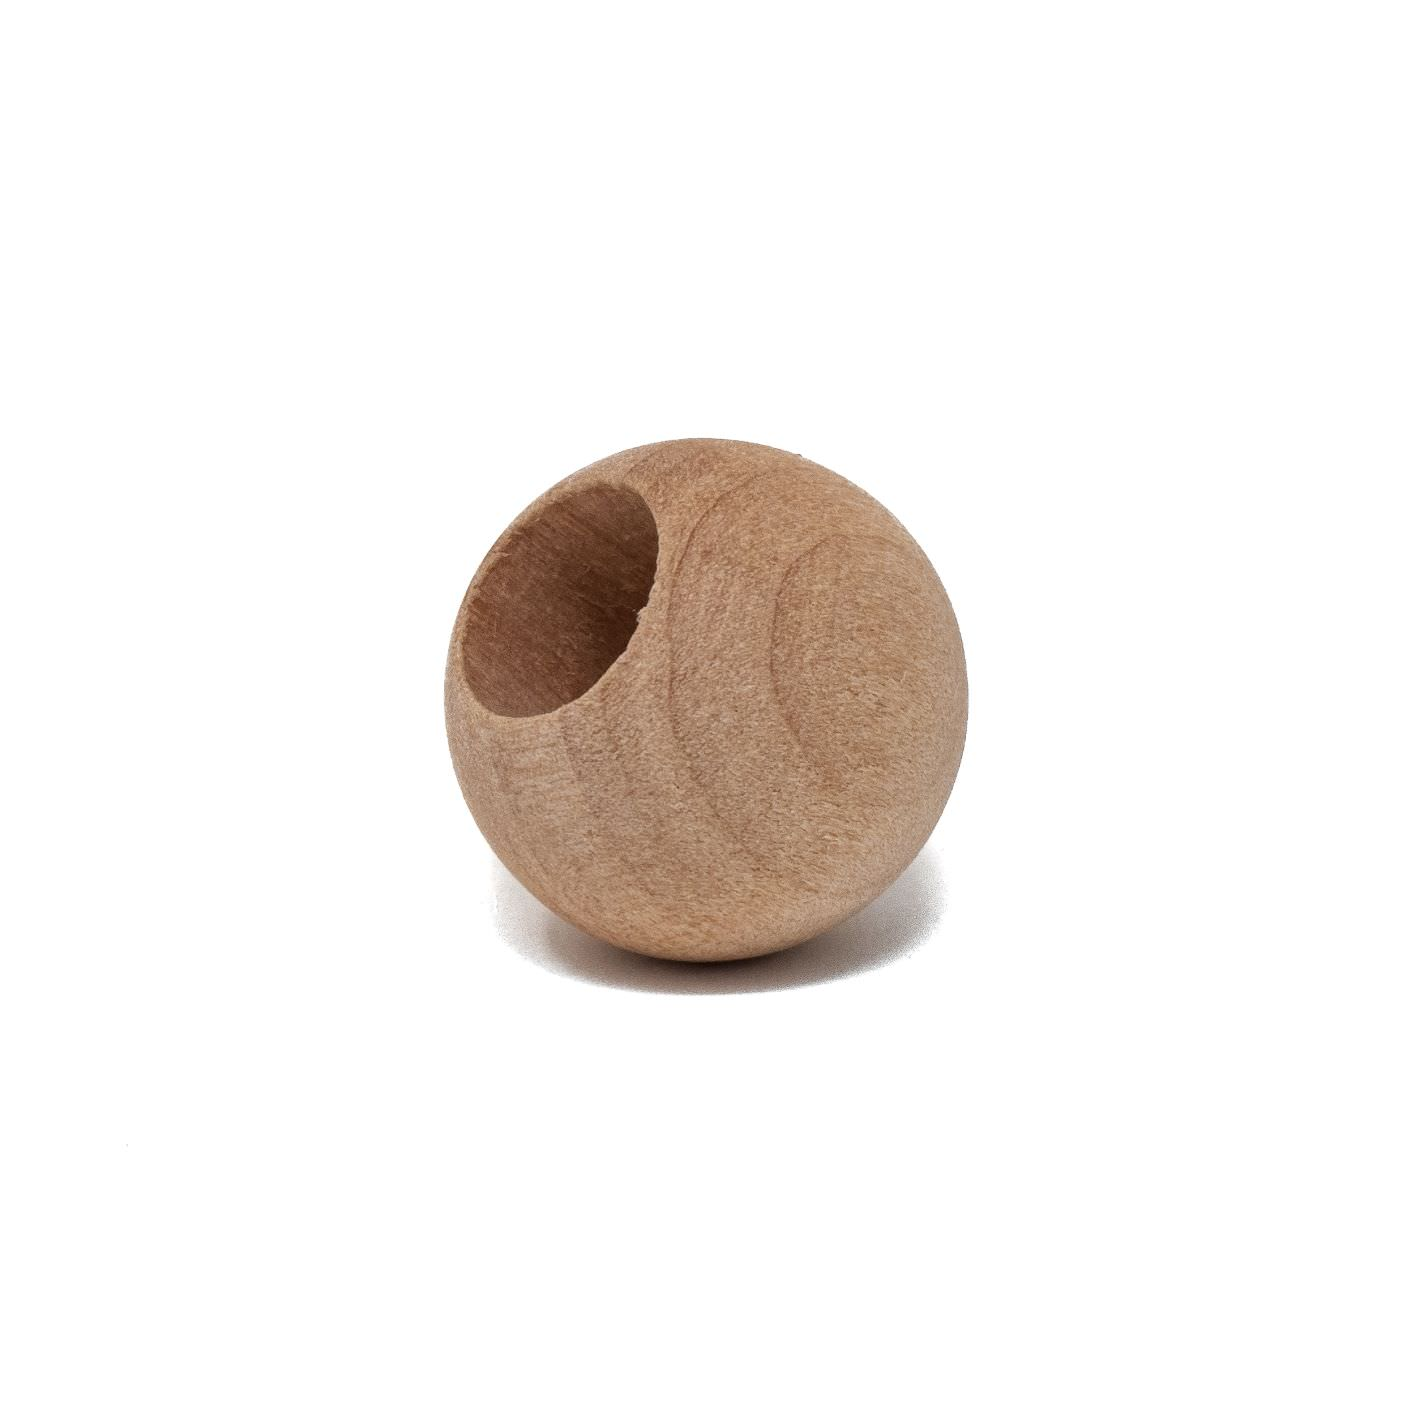 34 Wood Dowel Cap 38 Hole 12 Hole Depth